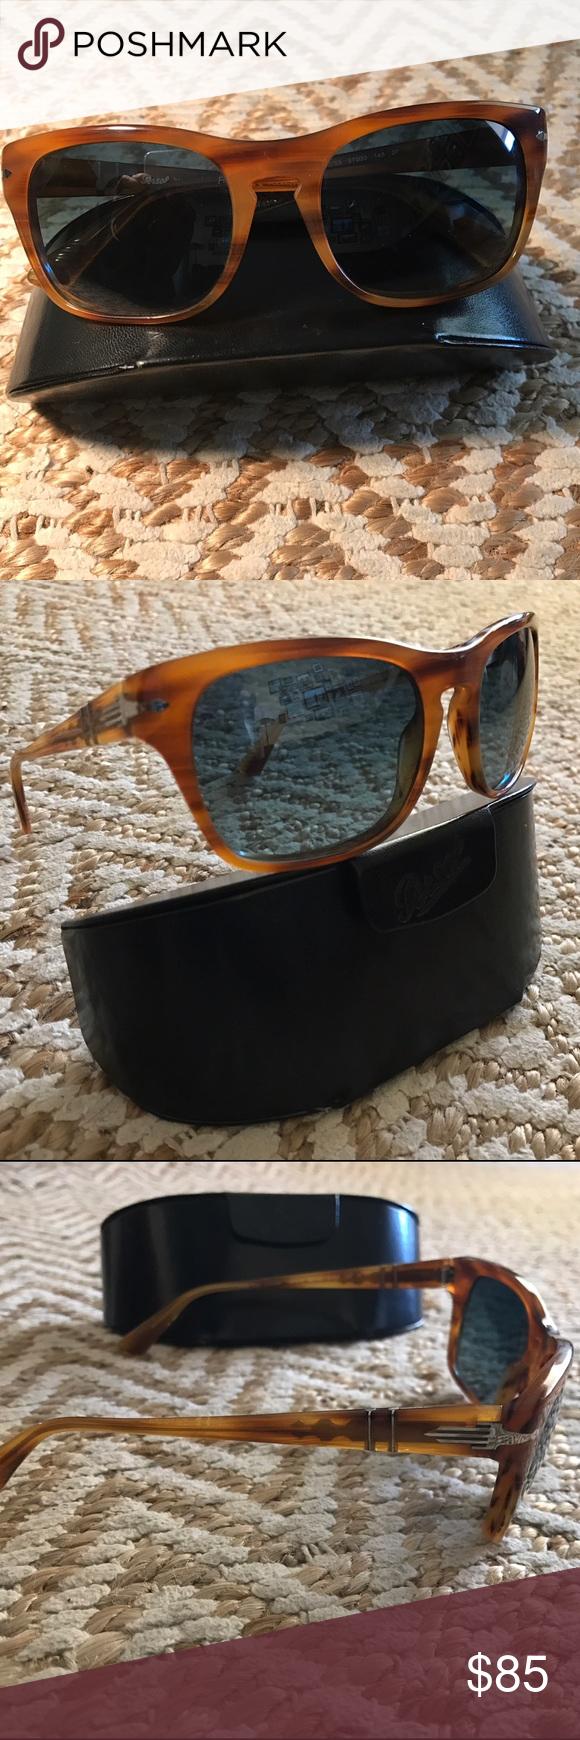 Persol Polarized Sunglasses with Original Case